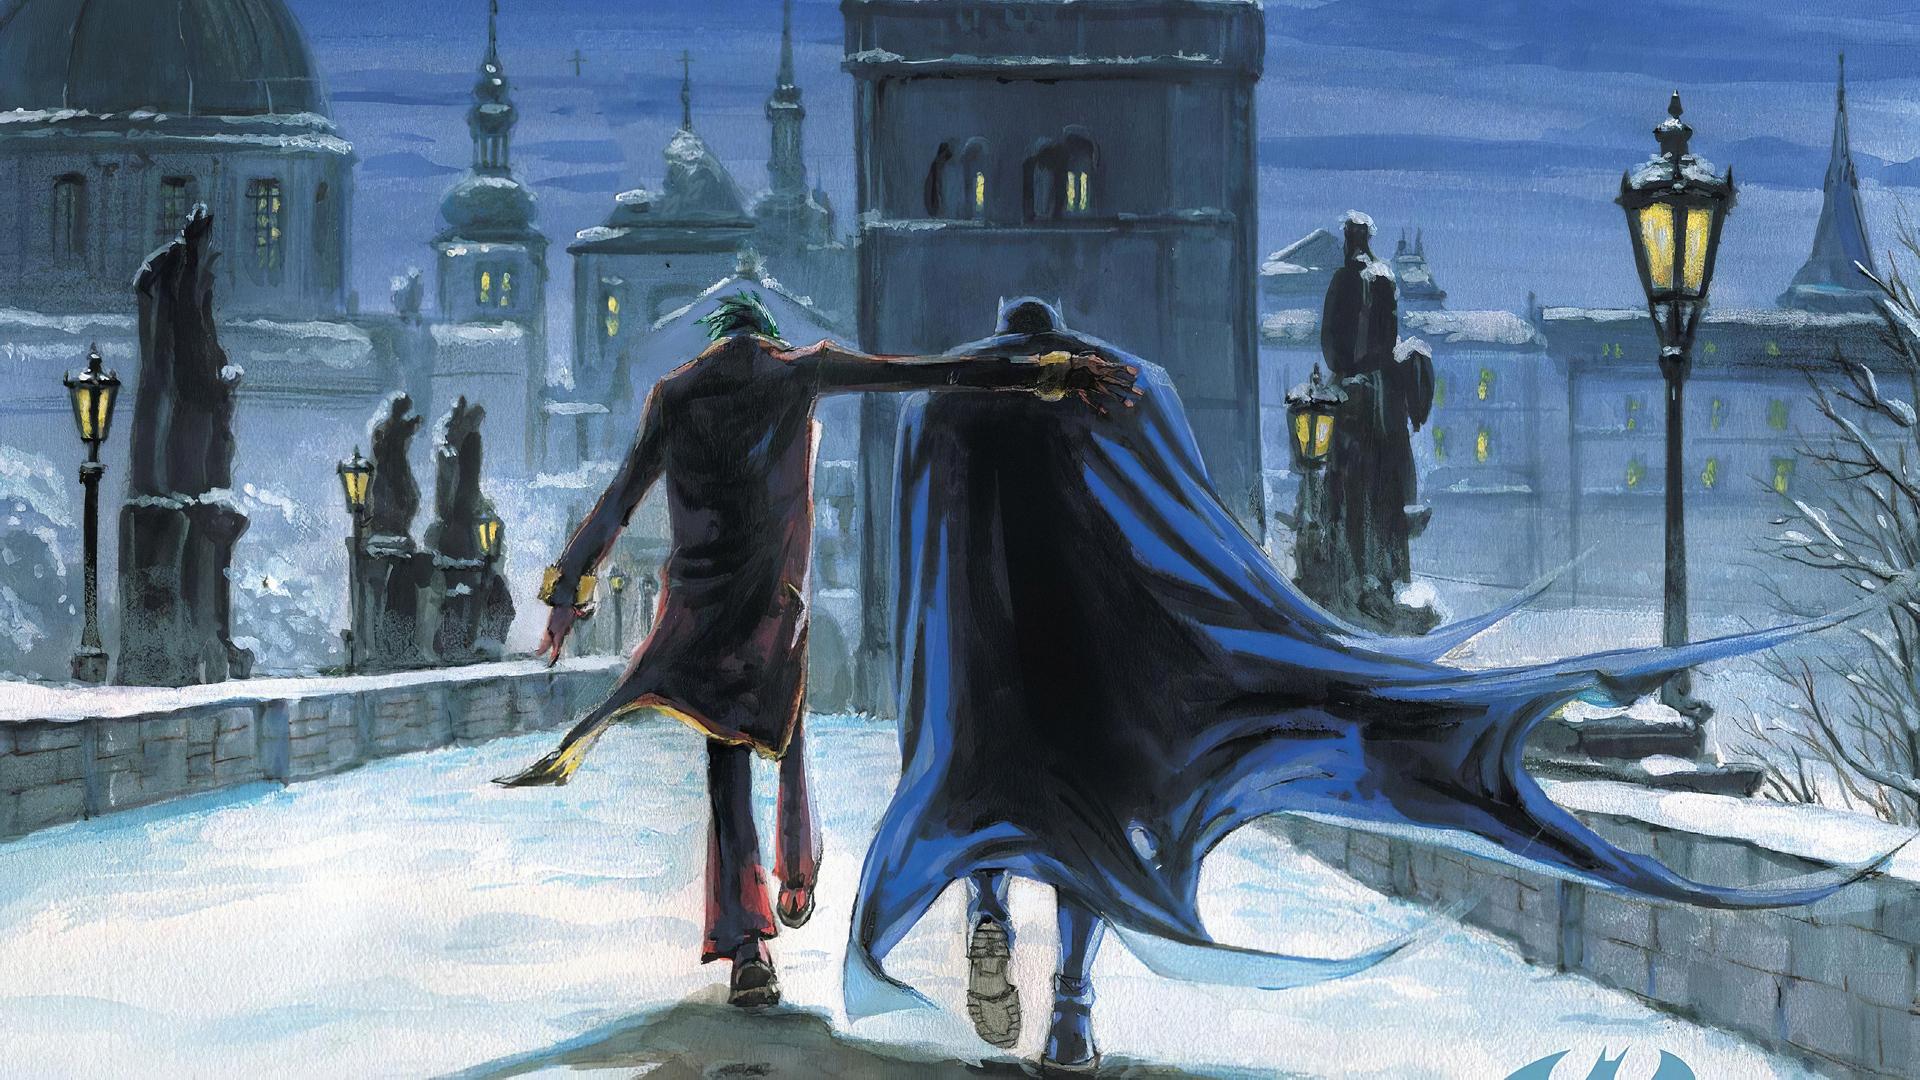 batman-joker-start-new-friendship-24.jpg